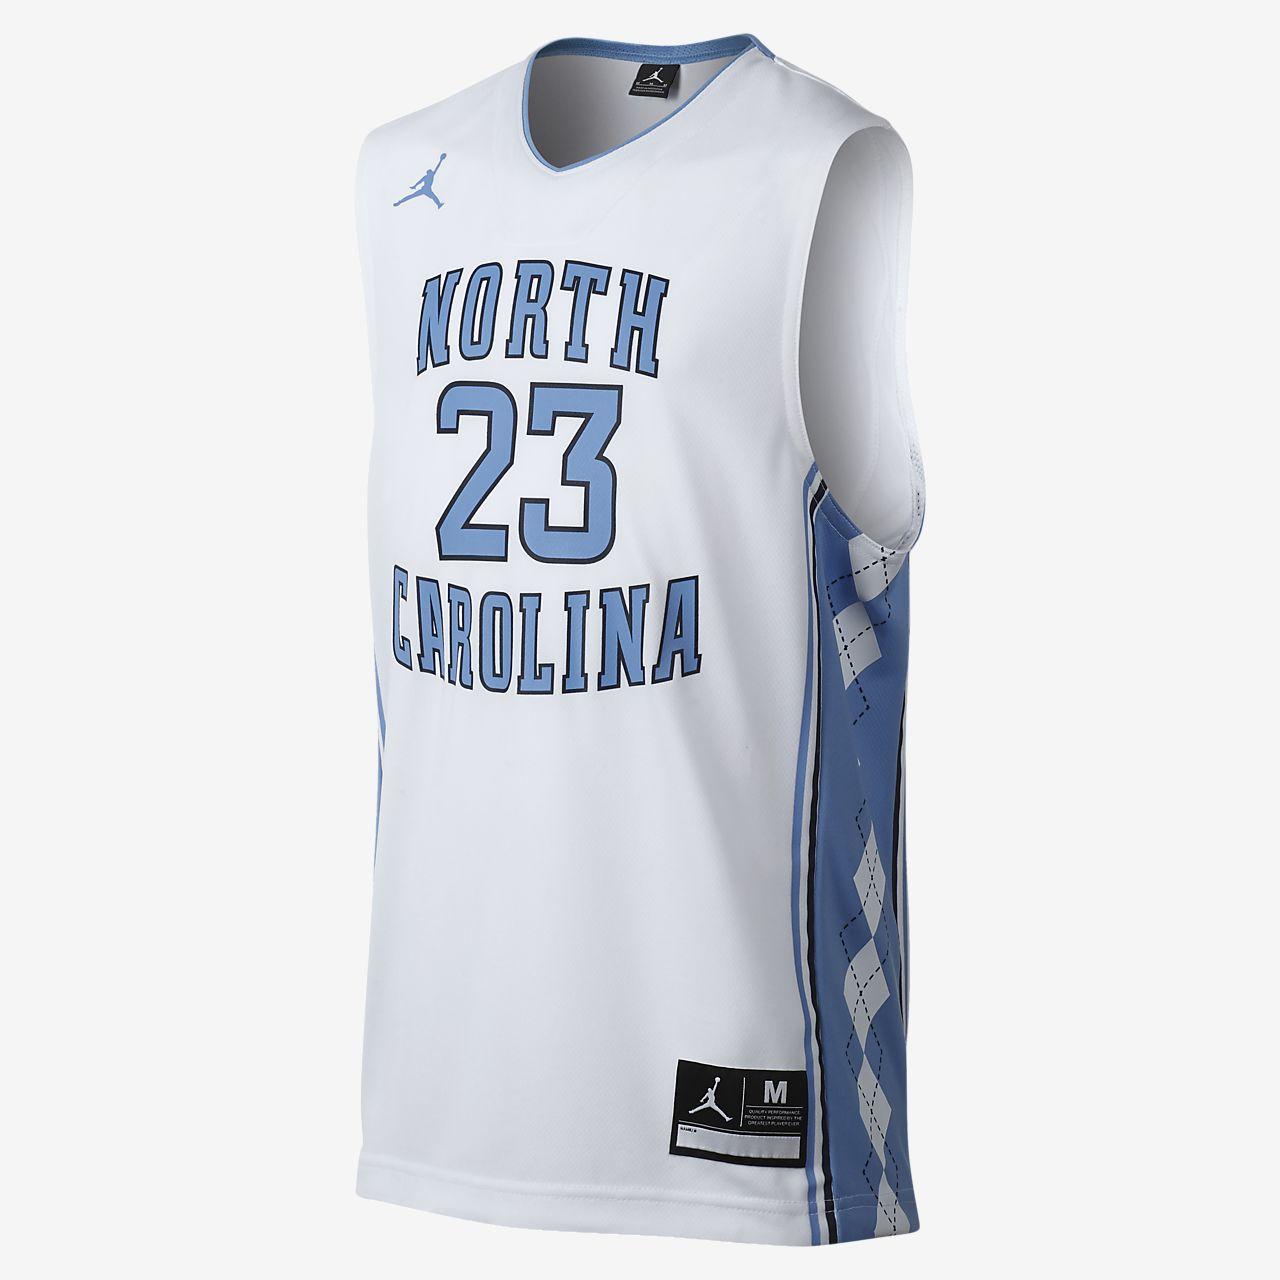 d297673c1 Jordan Replica (UNC) Big Kids  Basketball Jersey. Nike.com